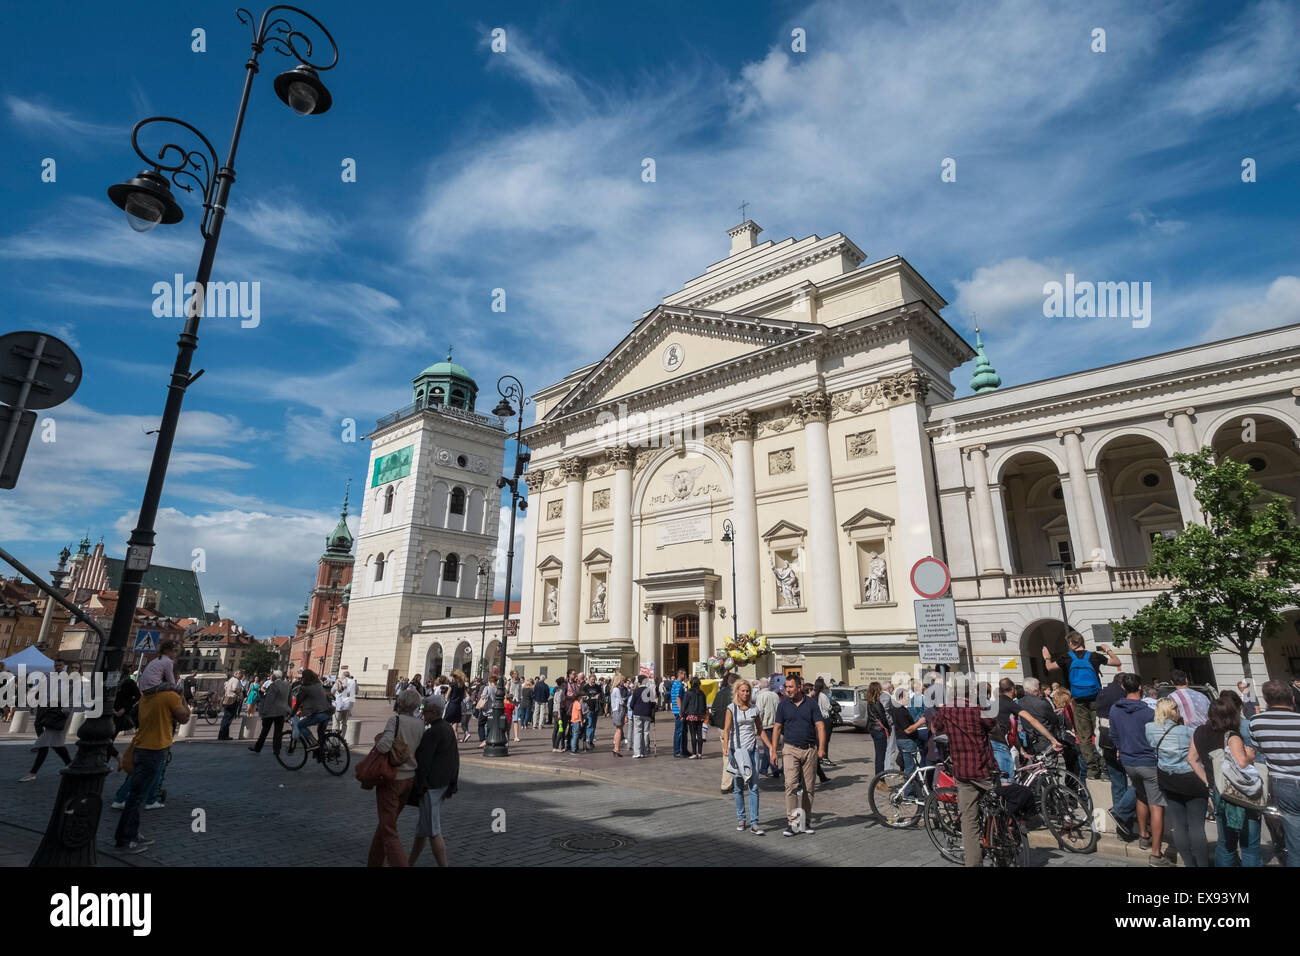 I turisti a piedi su Krakowskie Przedmiescie street, vicino a St Annes Chiesa, Varsavia, Polonia Immagini Stock